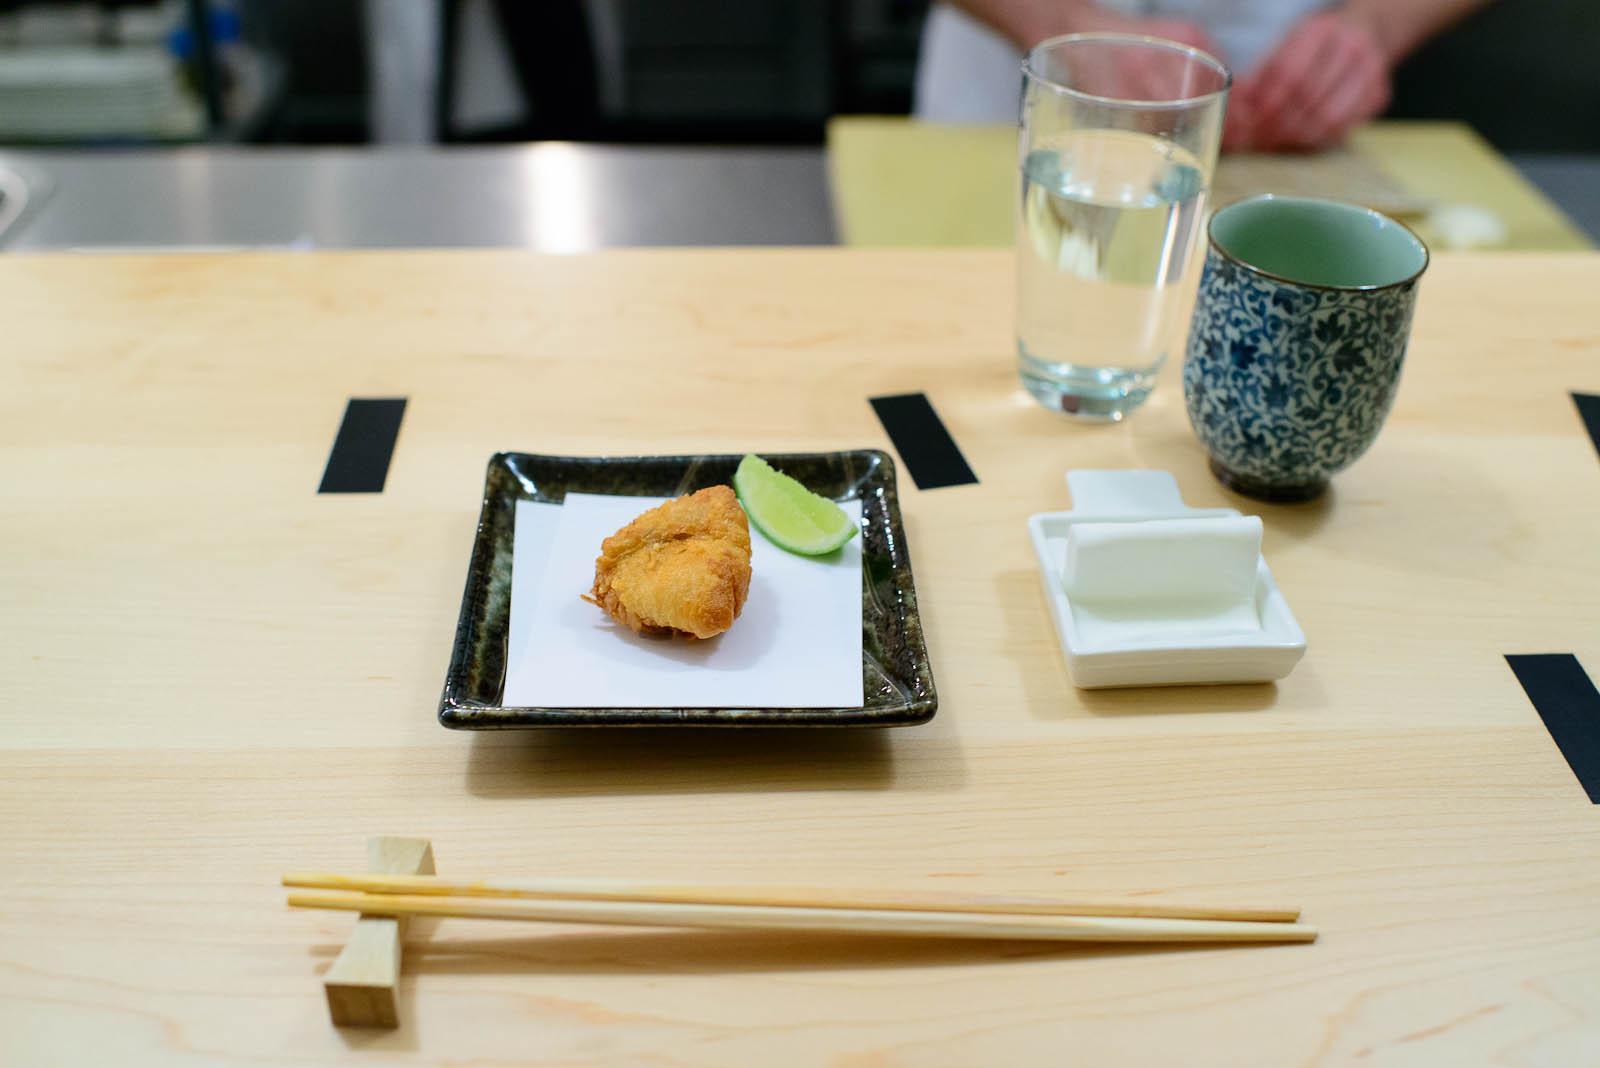 4th Course: Deep-fried blowfish